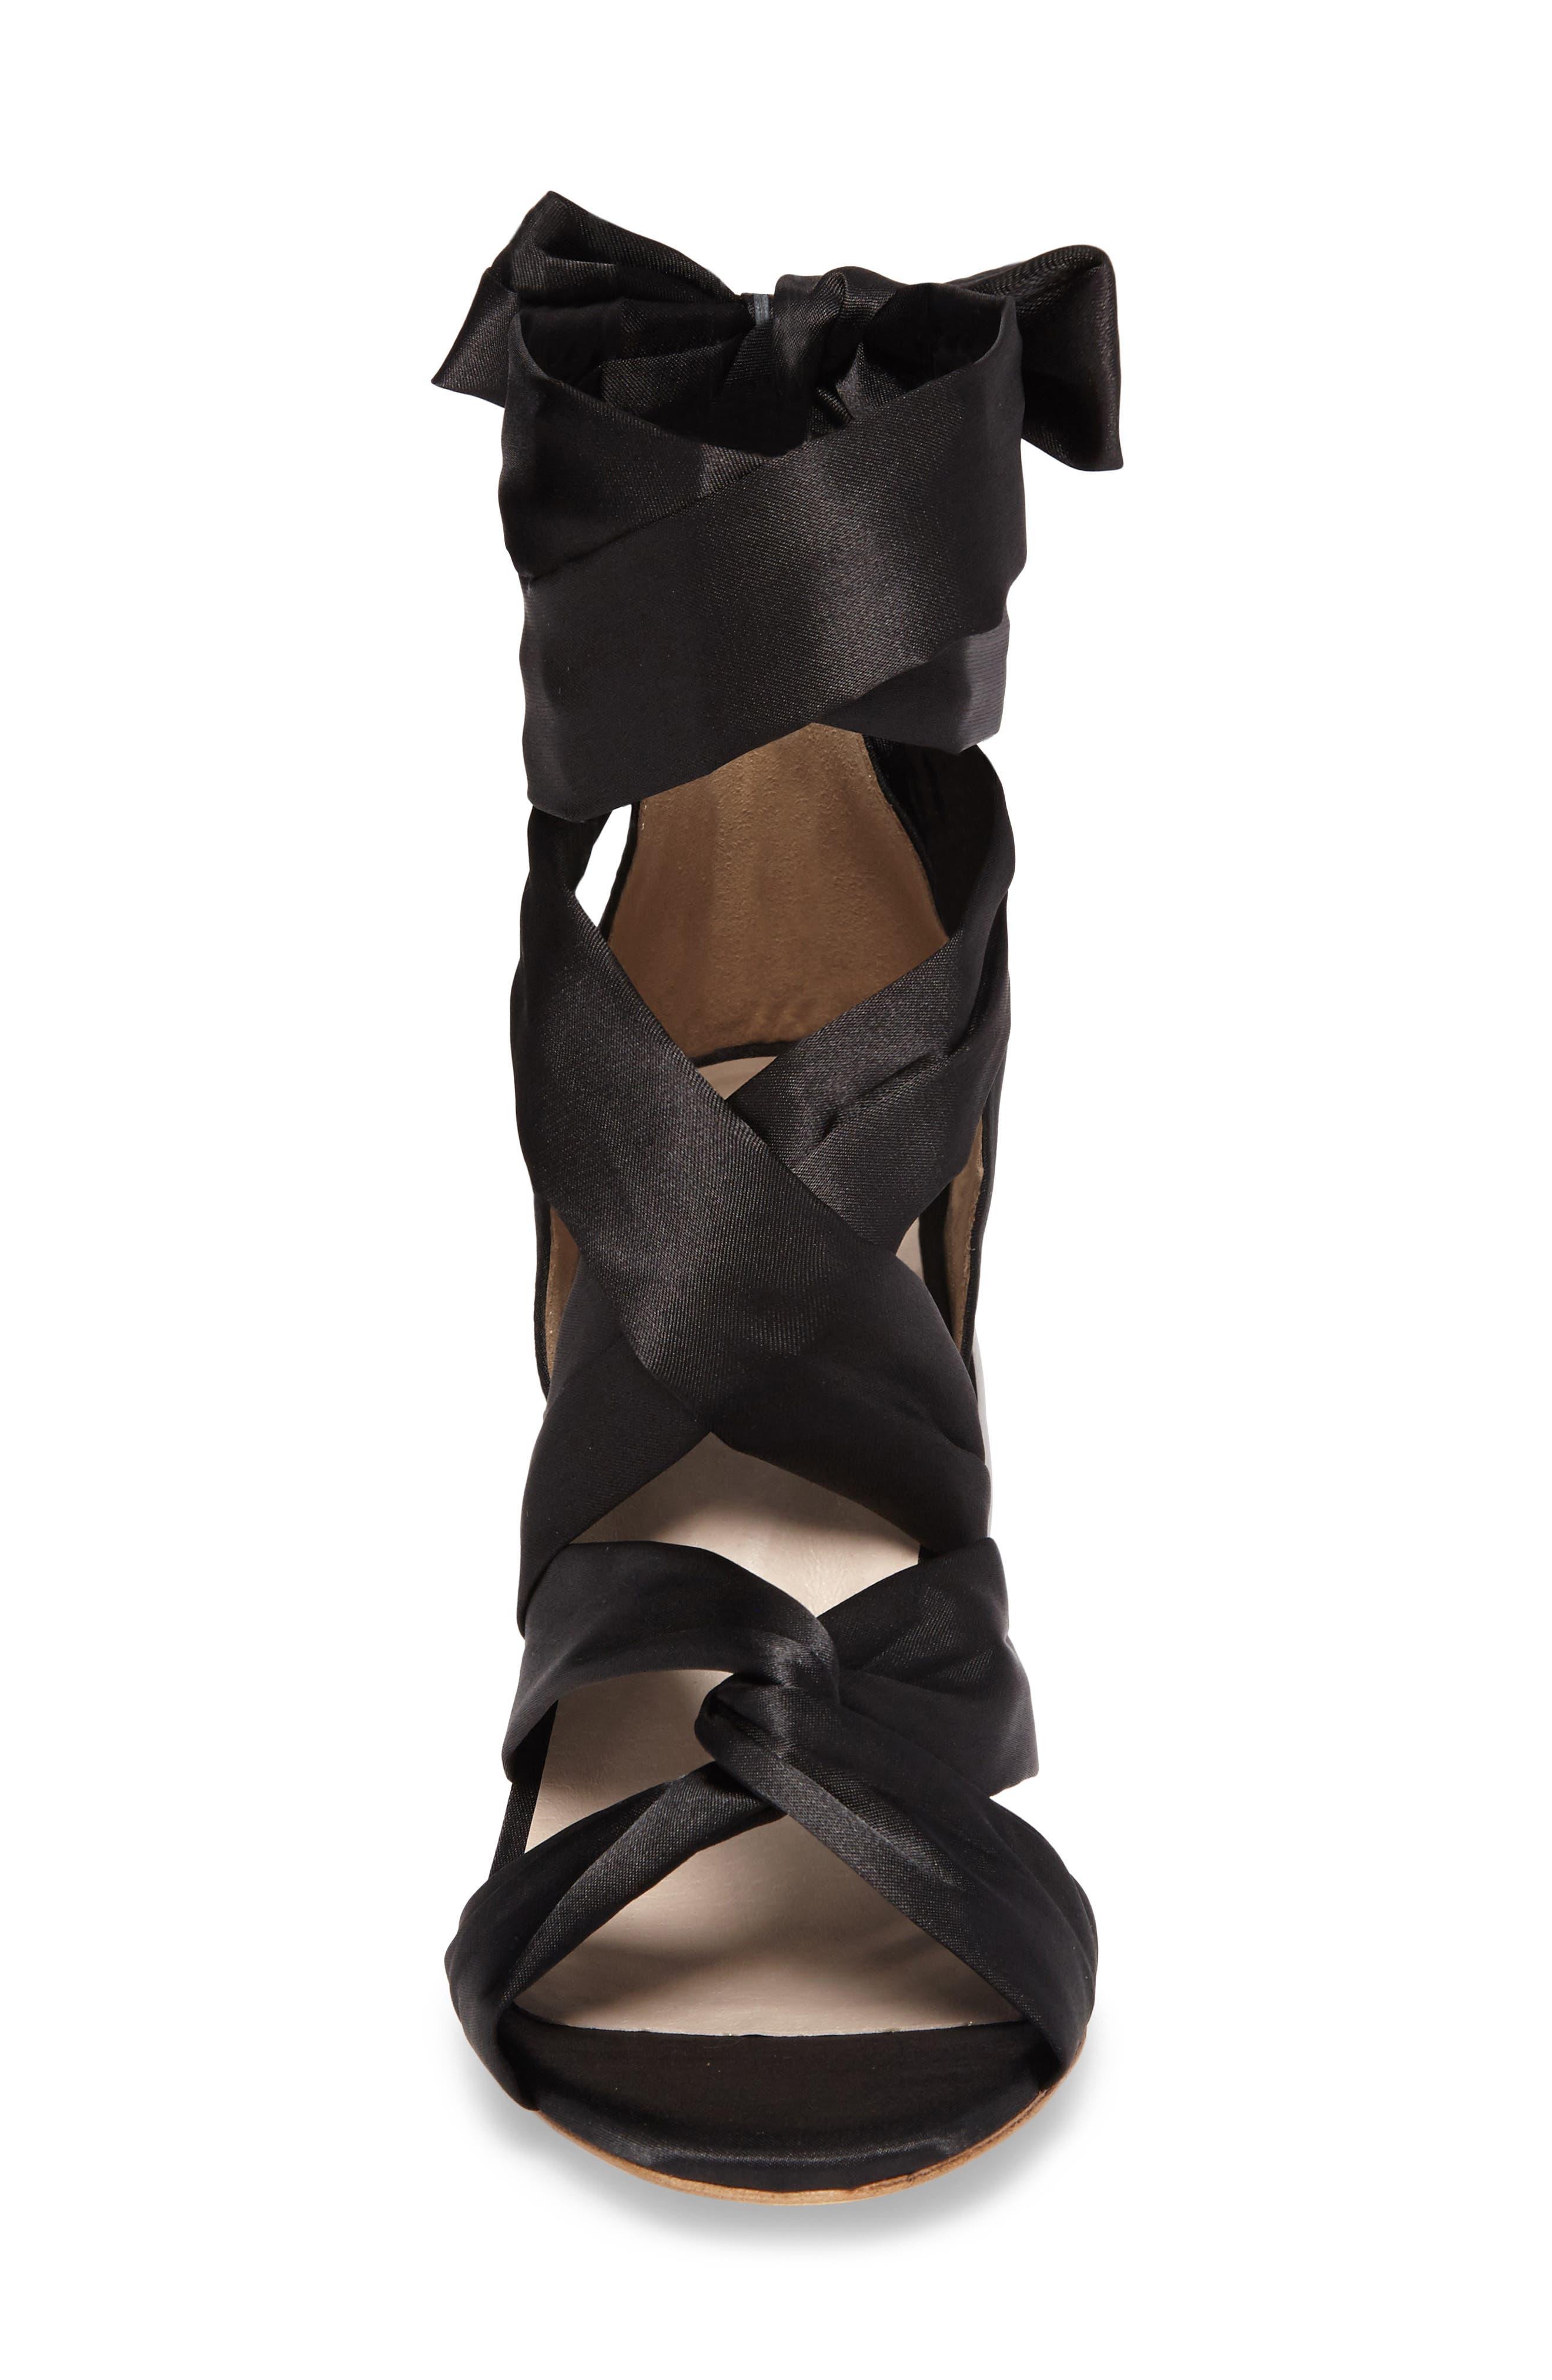 Myra Lace Up Sandal,                             Alternate thumbnail 4, color,                             004